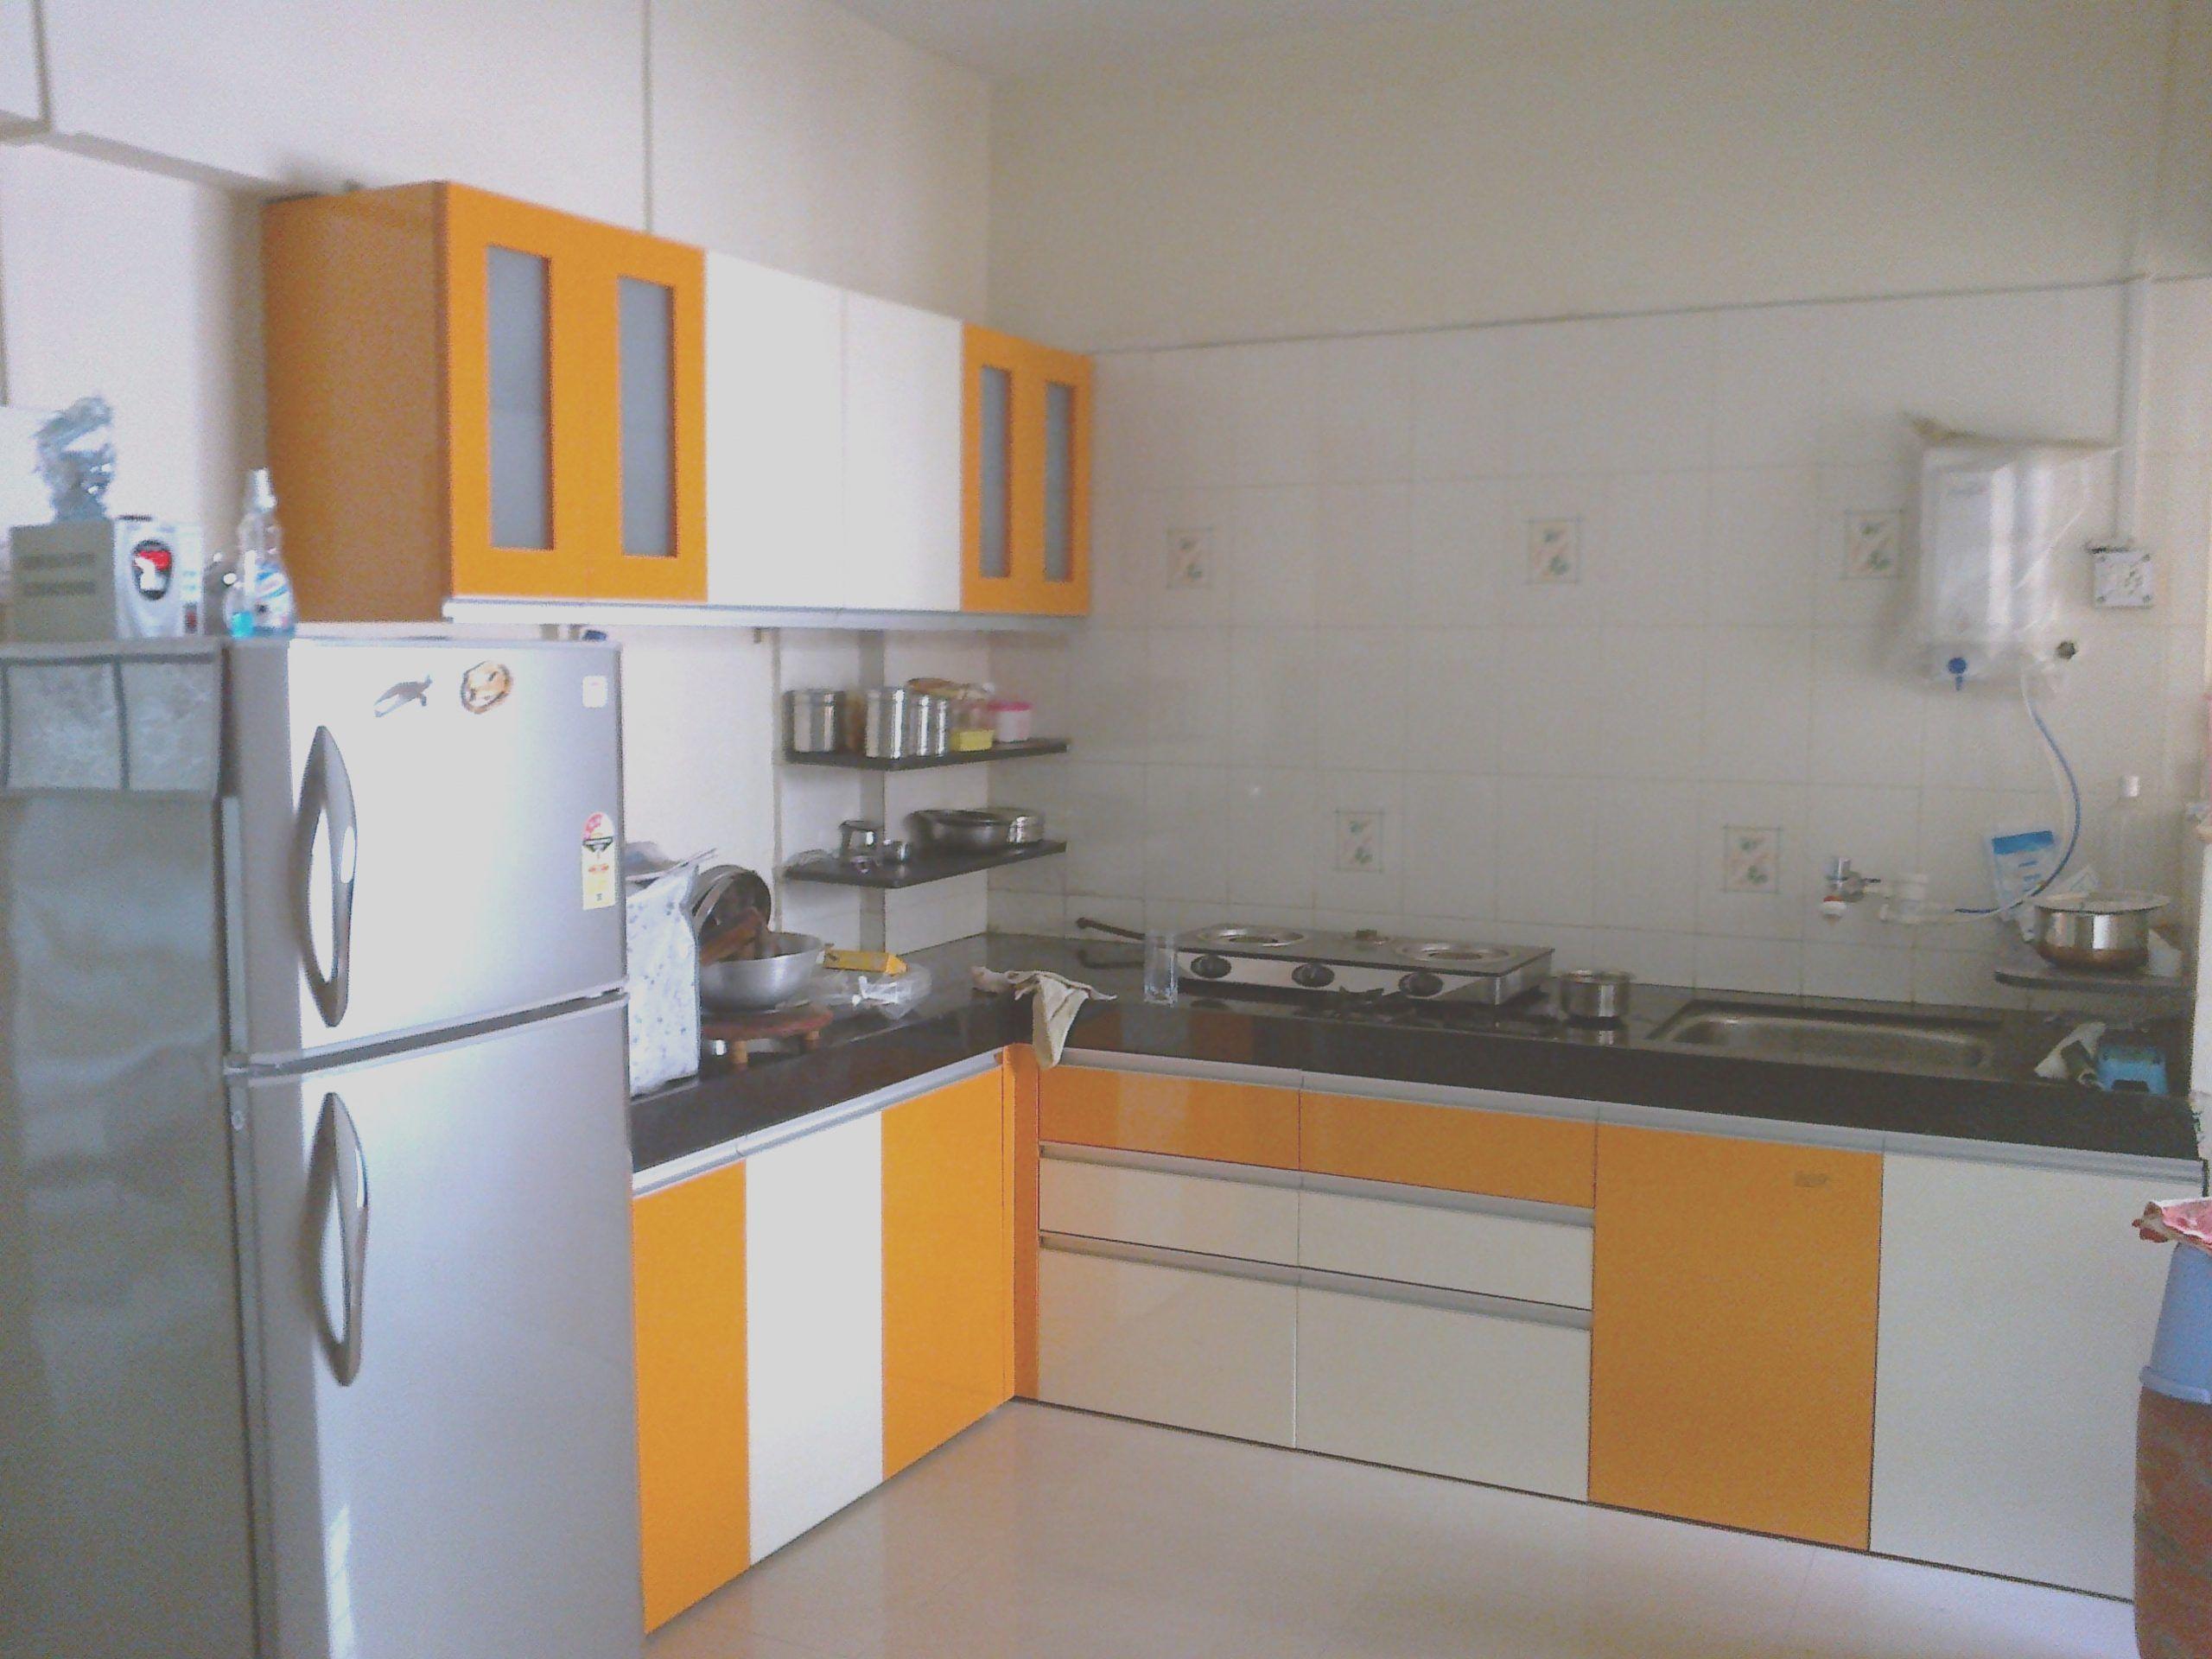 10 Terrific Kitchen Decor Pune Photos Indian Kitchen Design Ideas Interior Design Kitchen Kitchen Design Small